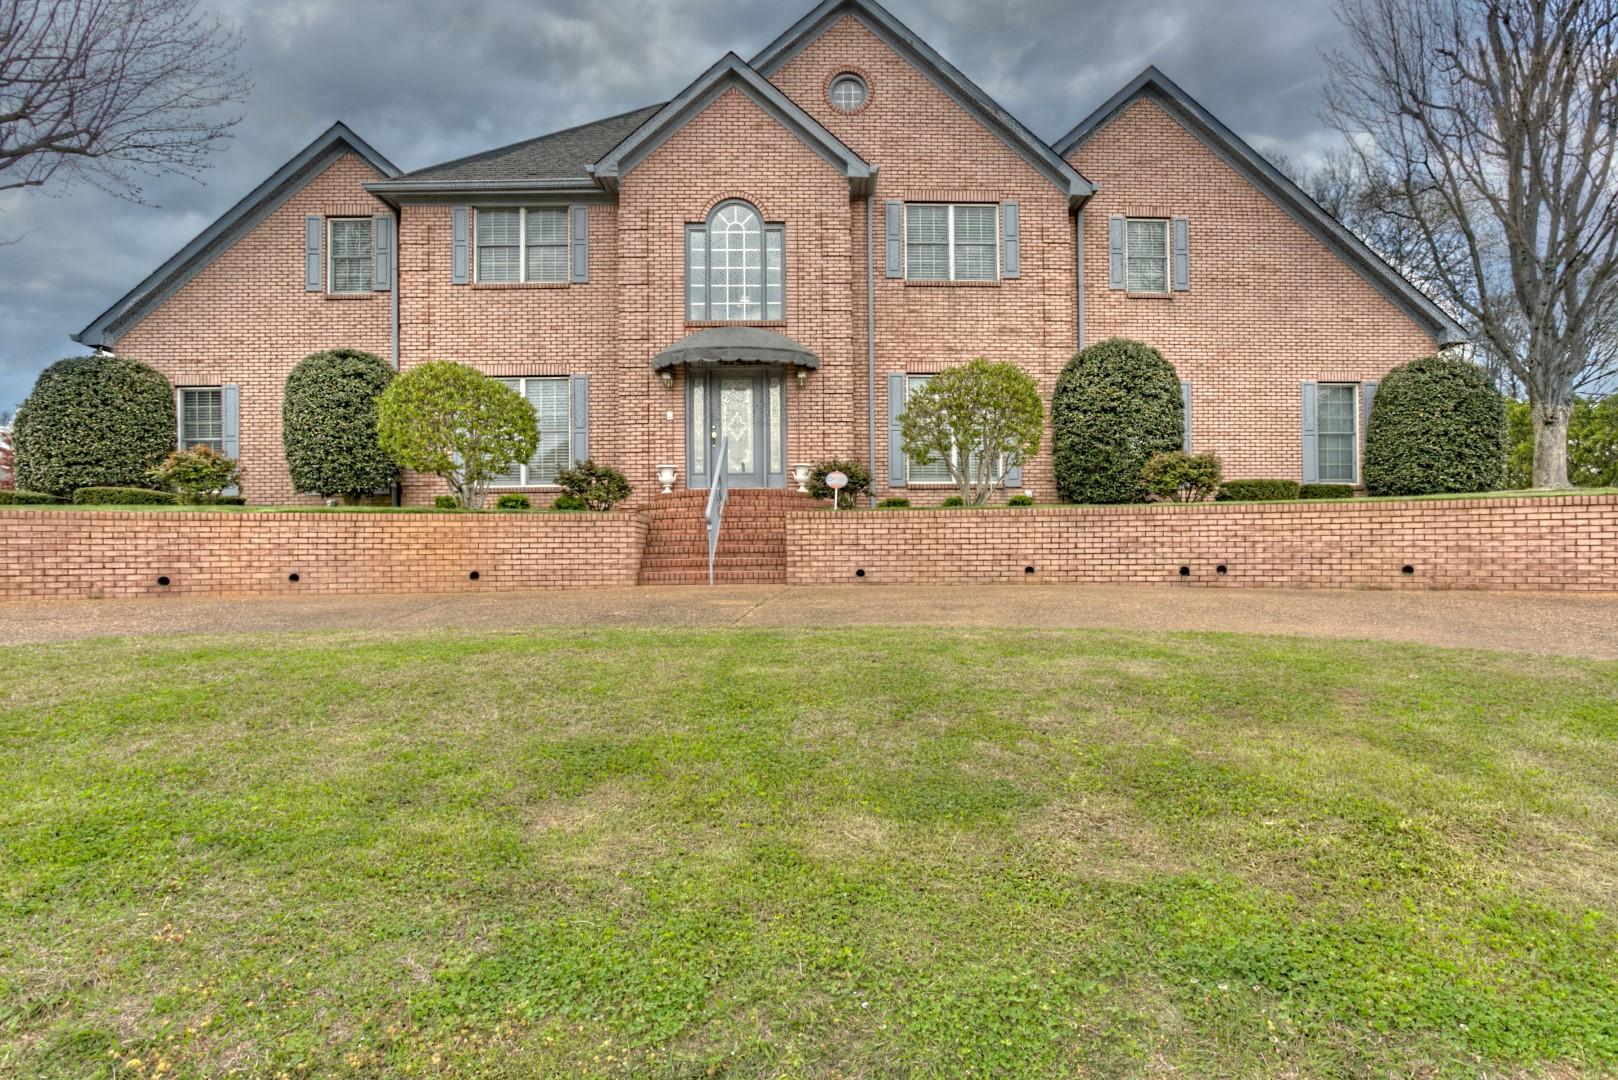 5801 Muirfield Ln, Chattanooga, TN 37416